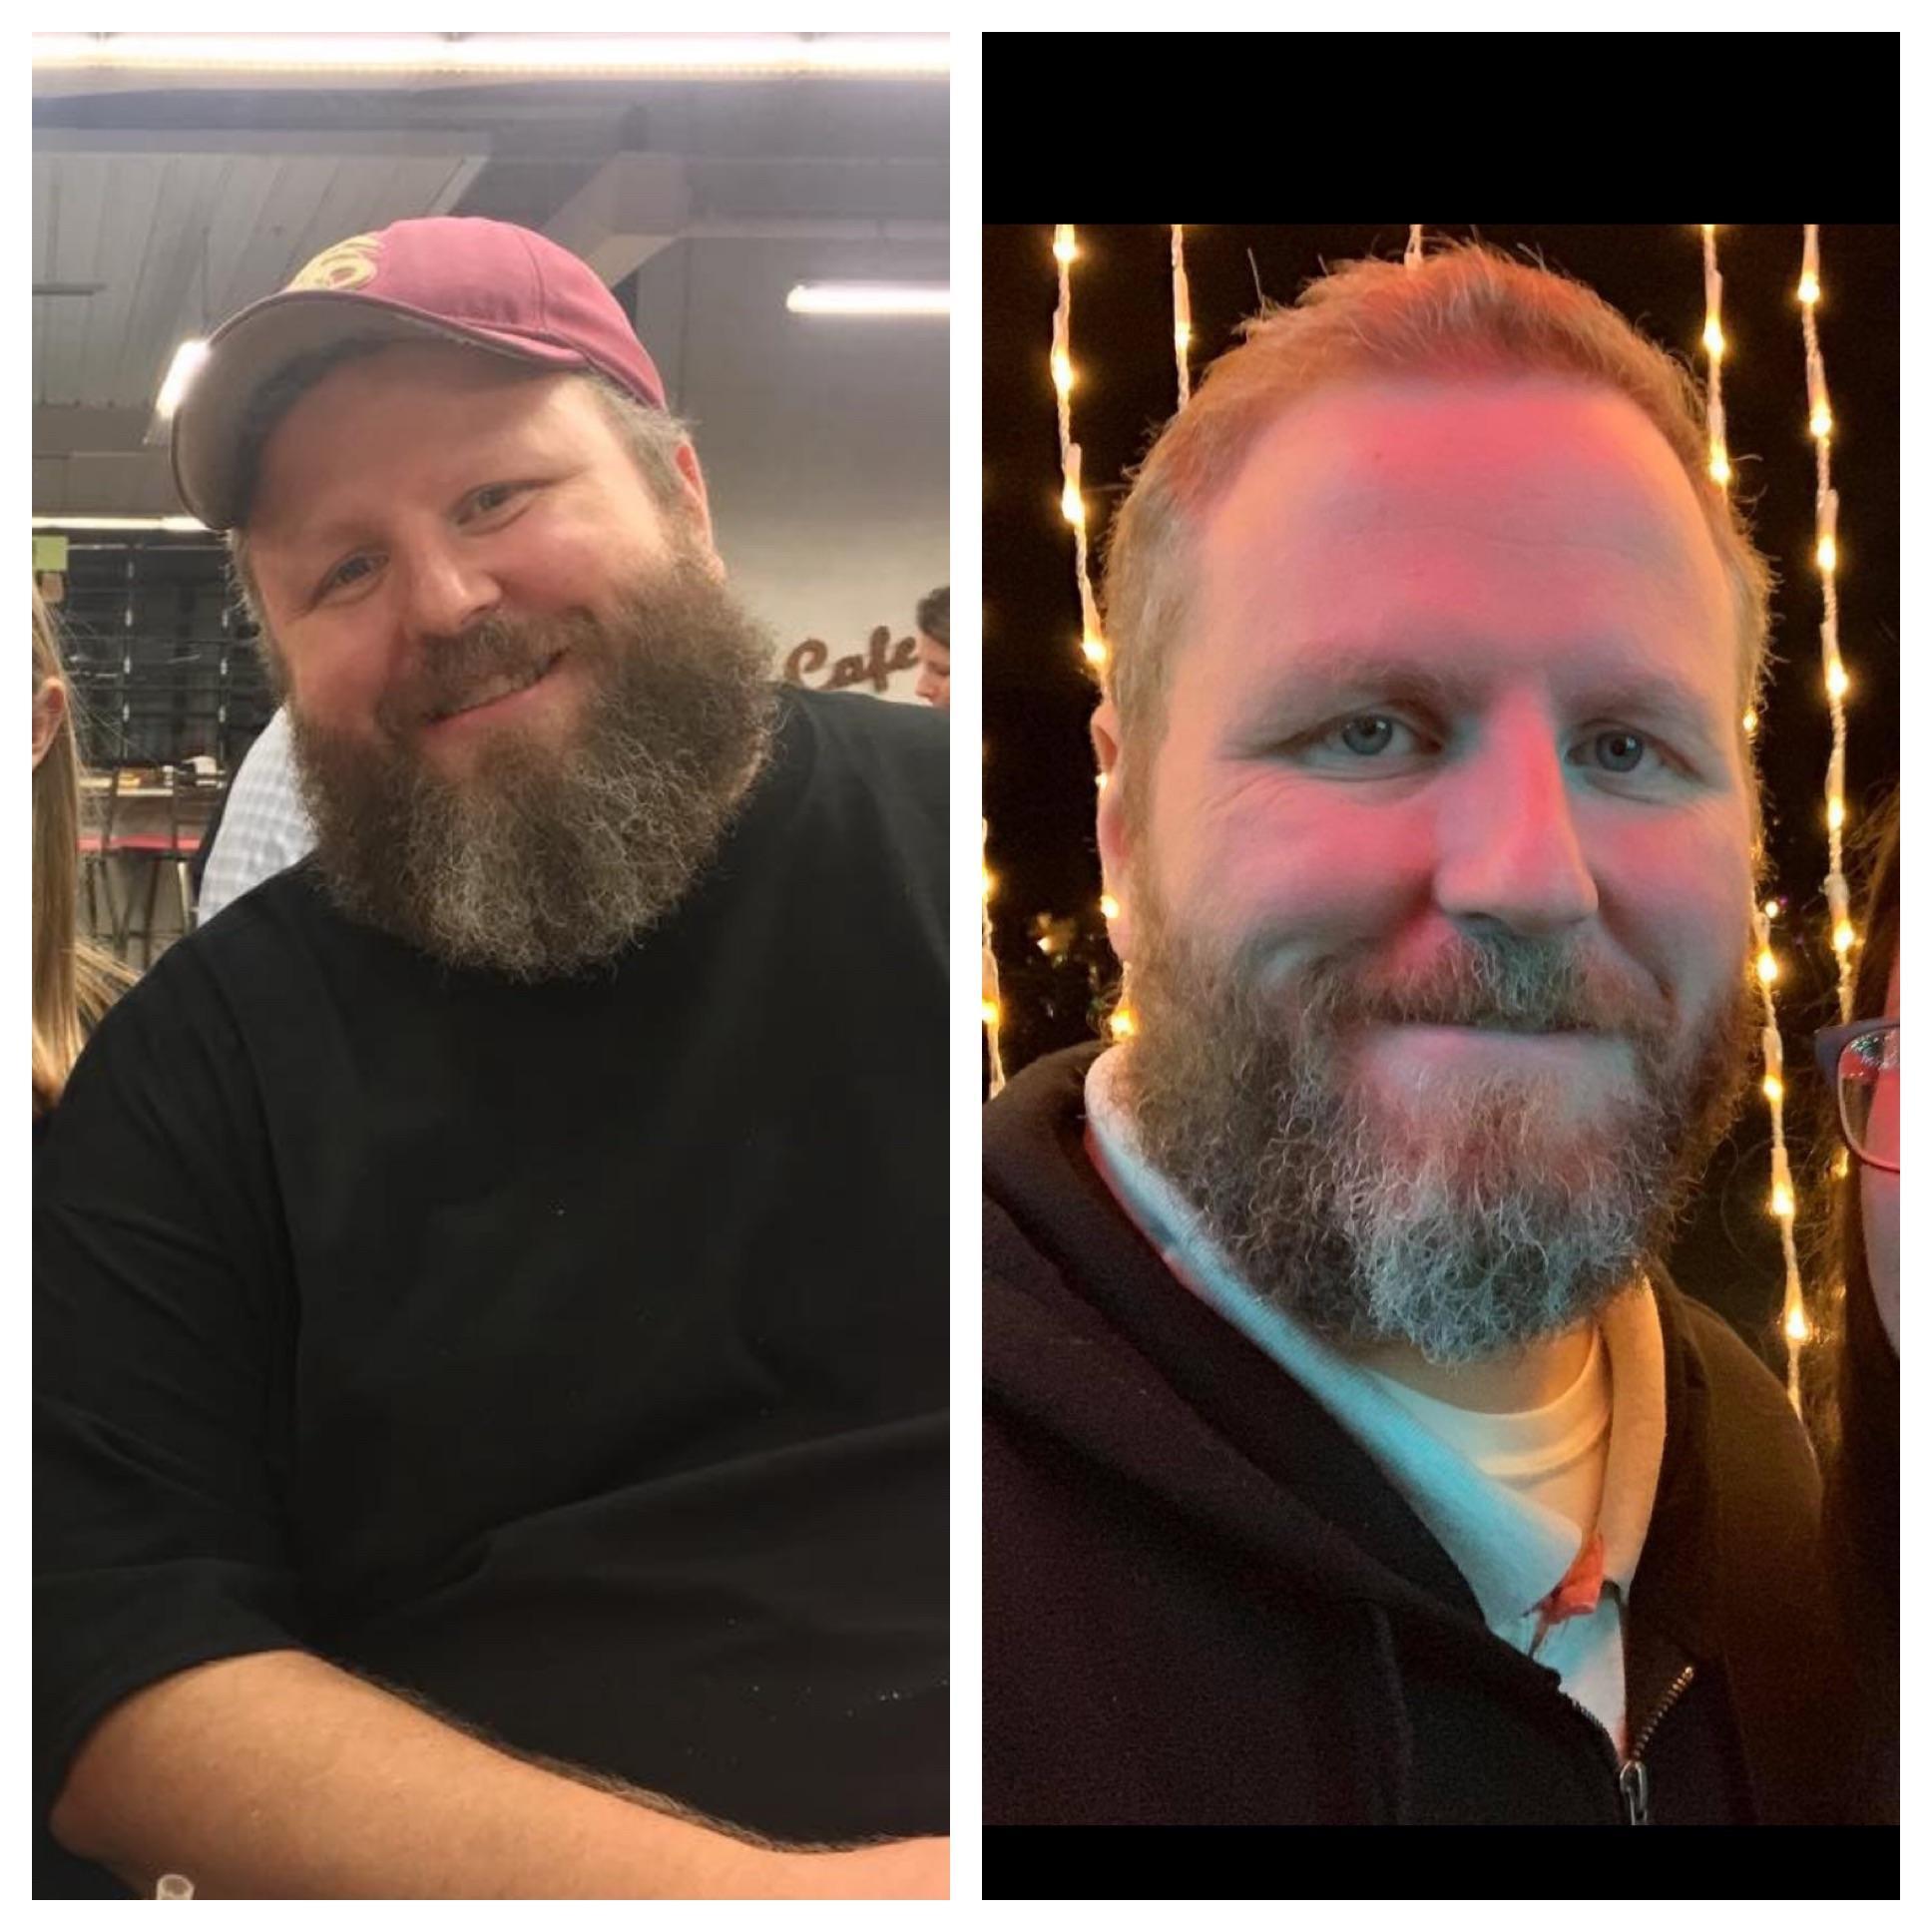 128 lbs Weight Loss 6 foot Male 387 lbs to 259 lbs